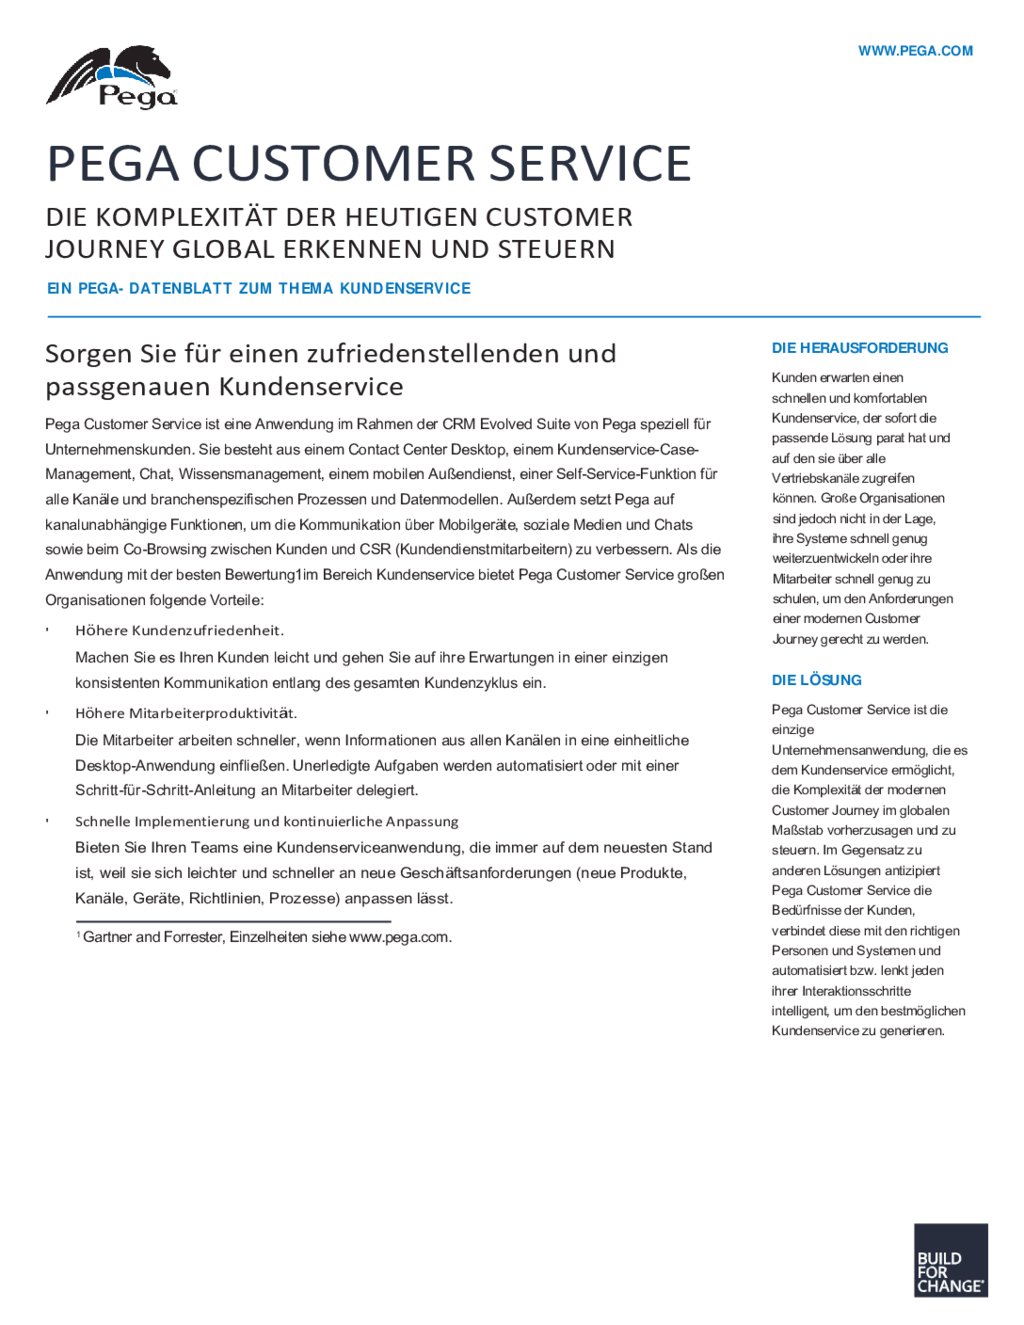 Pega Customer Service Application (Deutsch) | Drupal